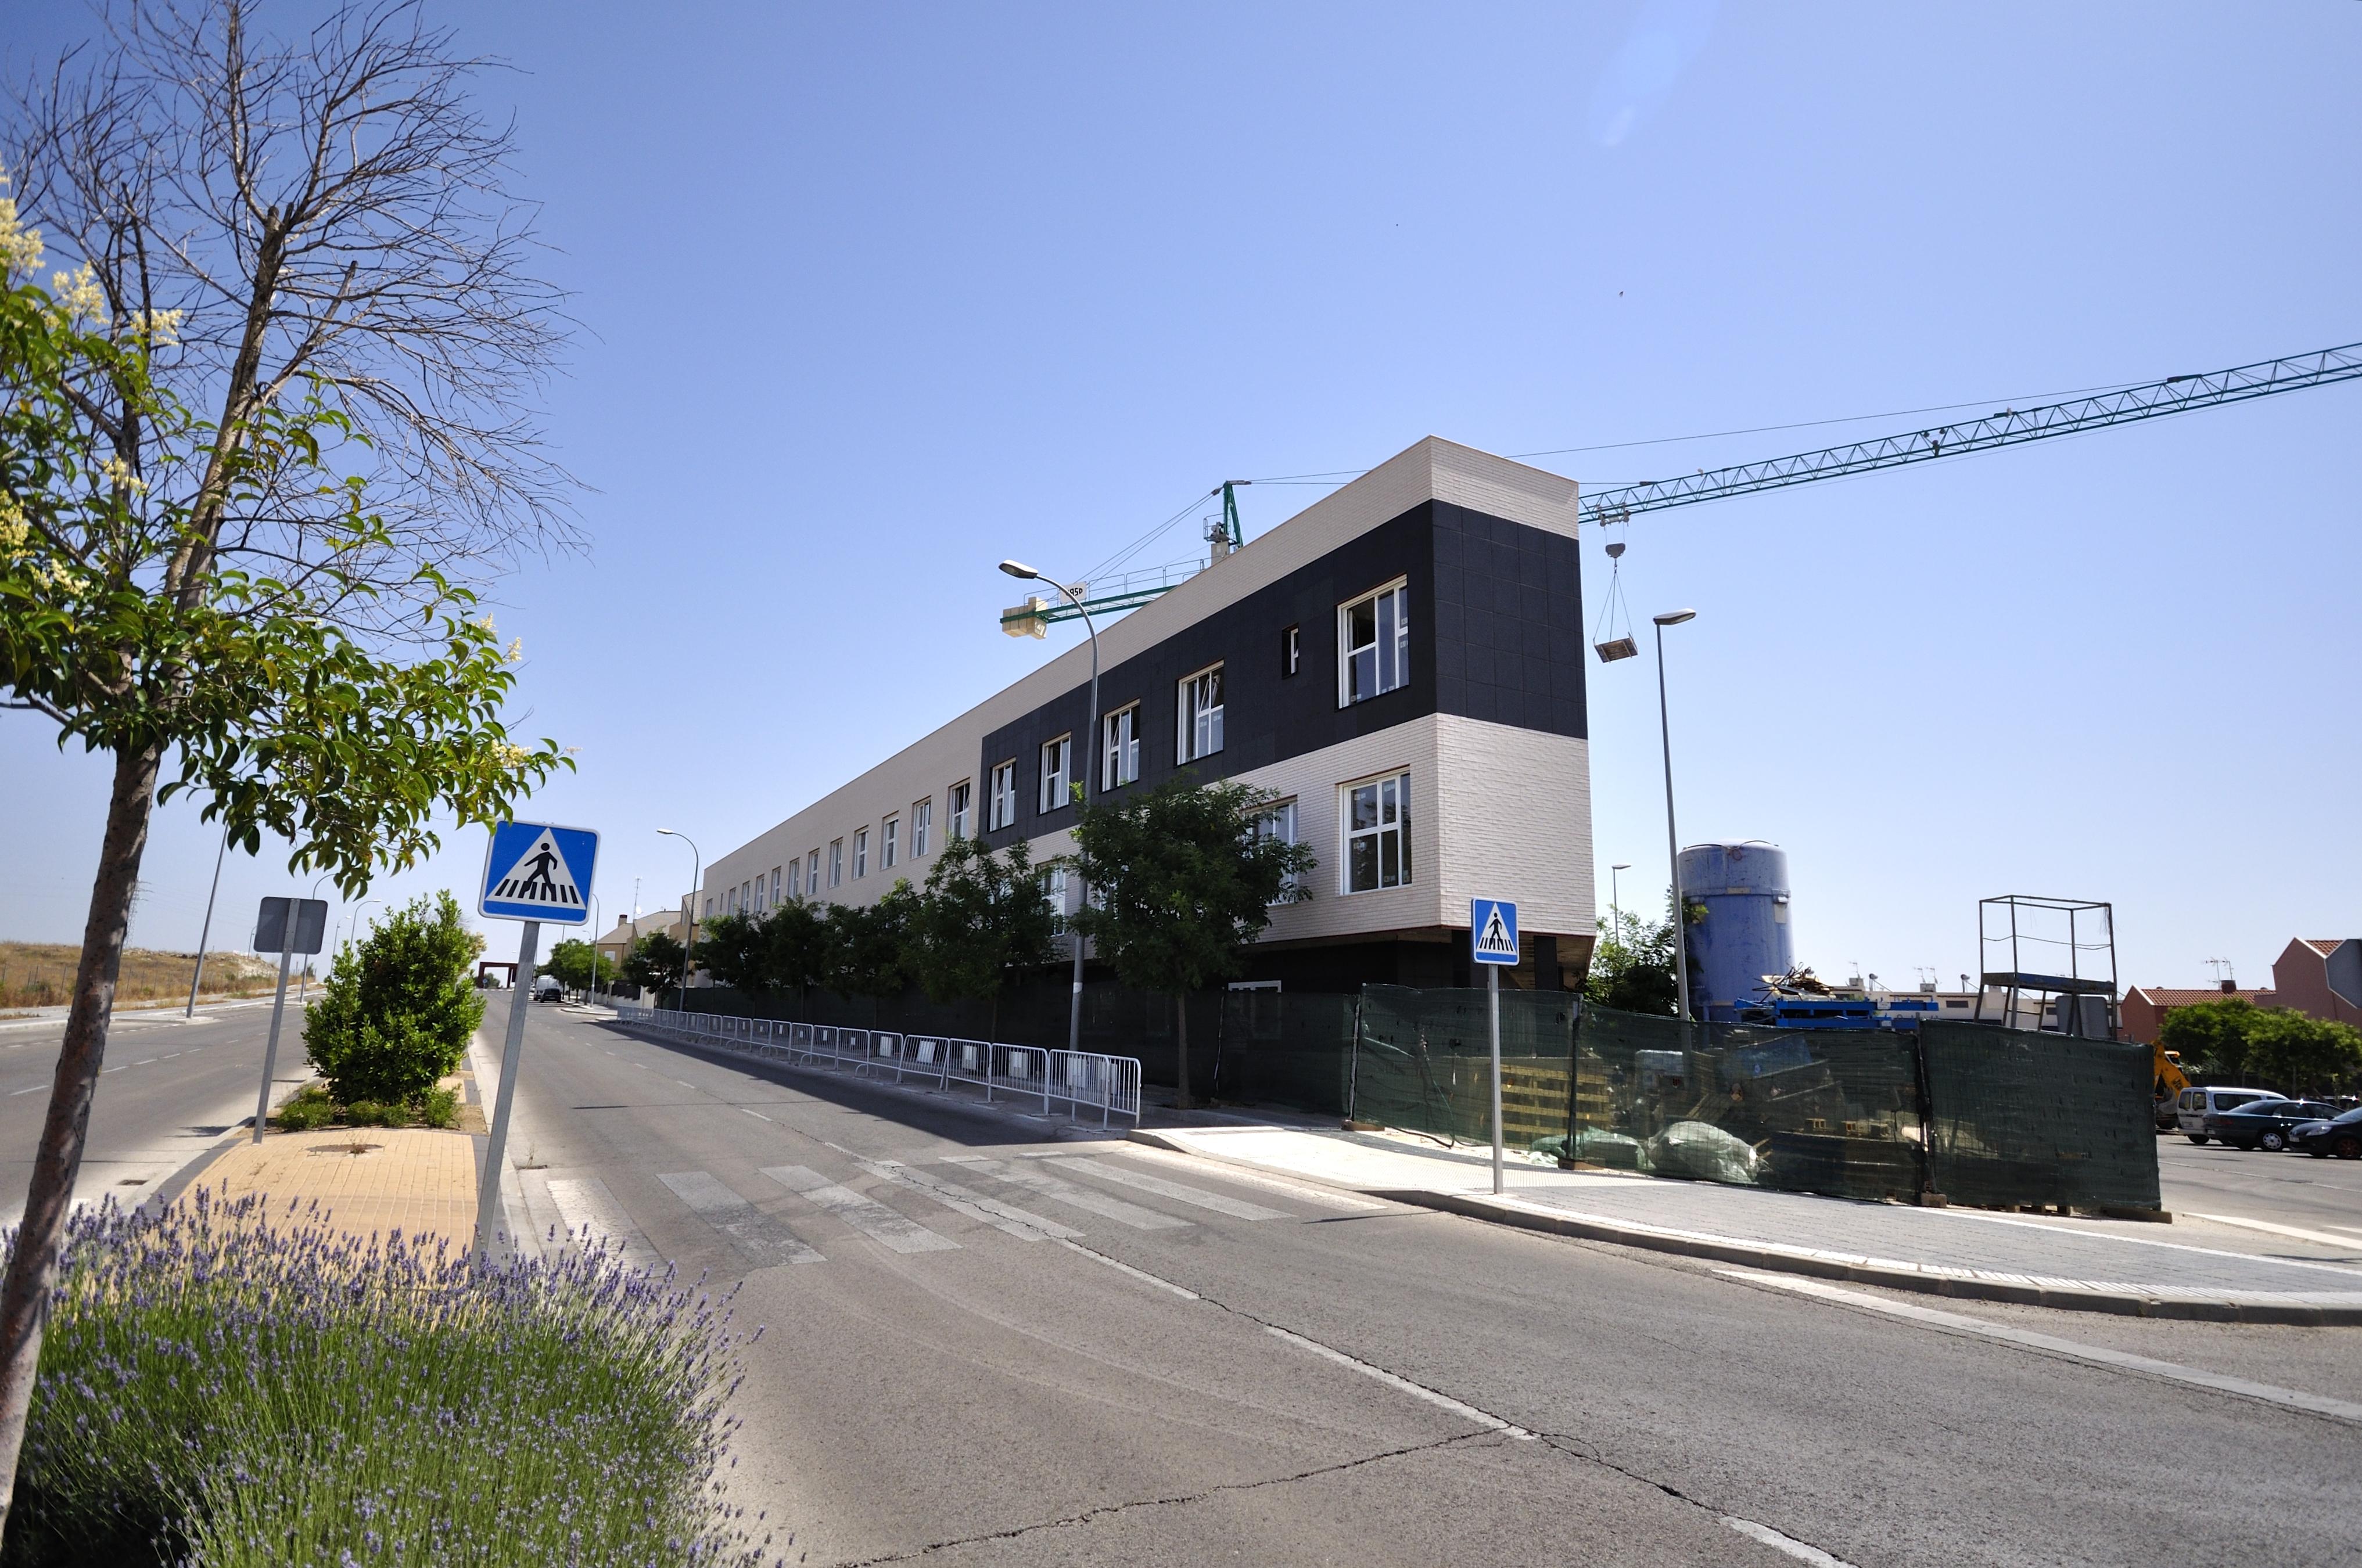 Residencia Valdemoro